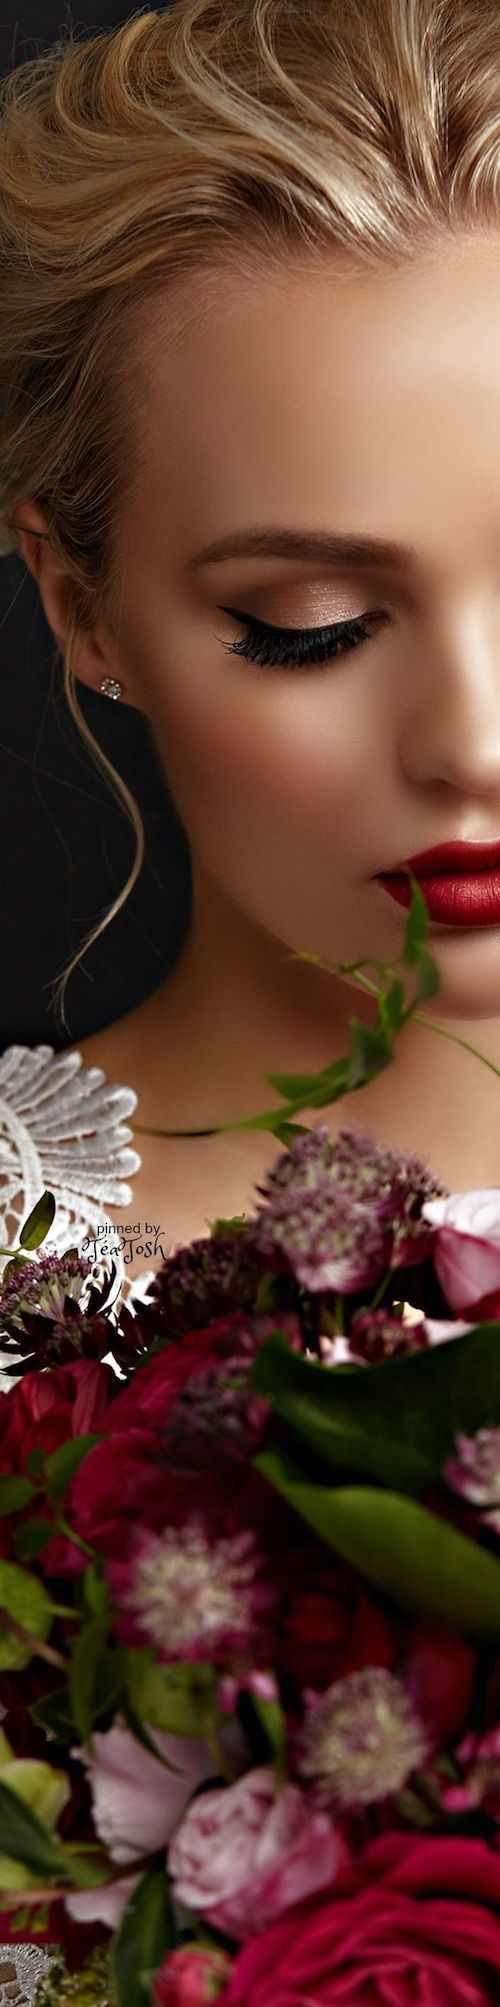 Ten listo todo para que tu día sea perfecto #Wedding #Makeup #Bride #Beauty #WeddingDay #Flowers #Boda